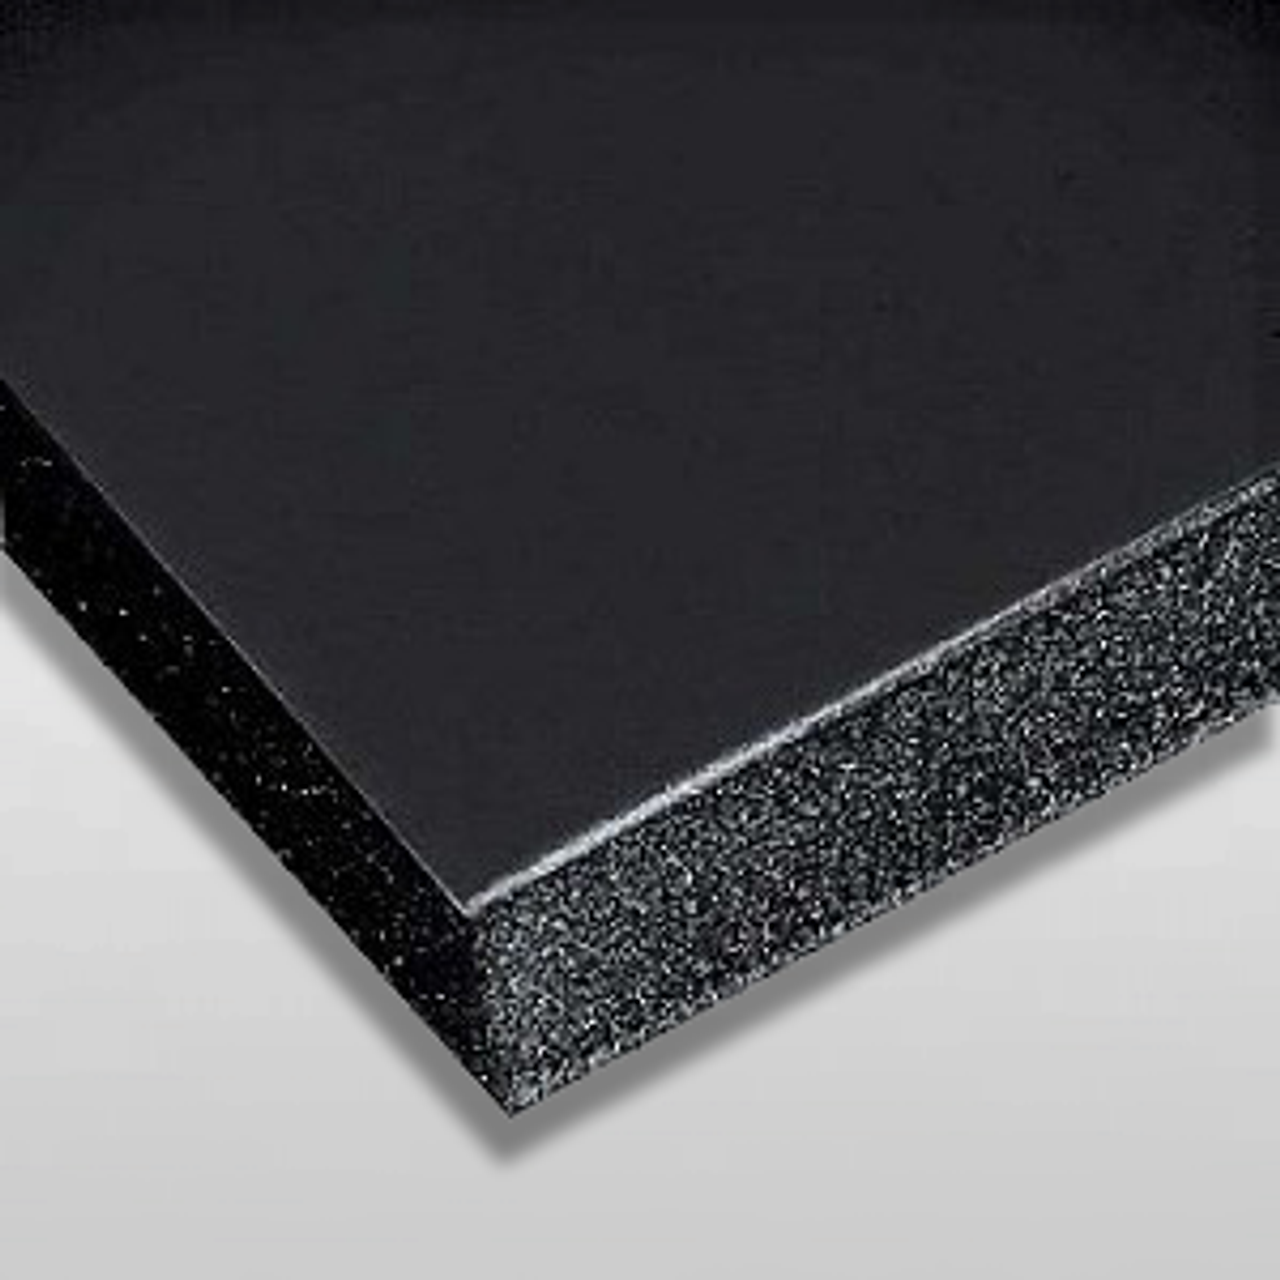 24x36 3//16 Acid Free White Foam Core